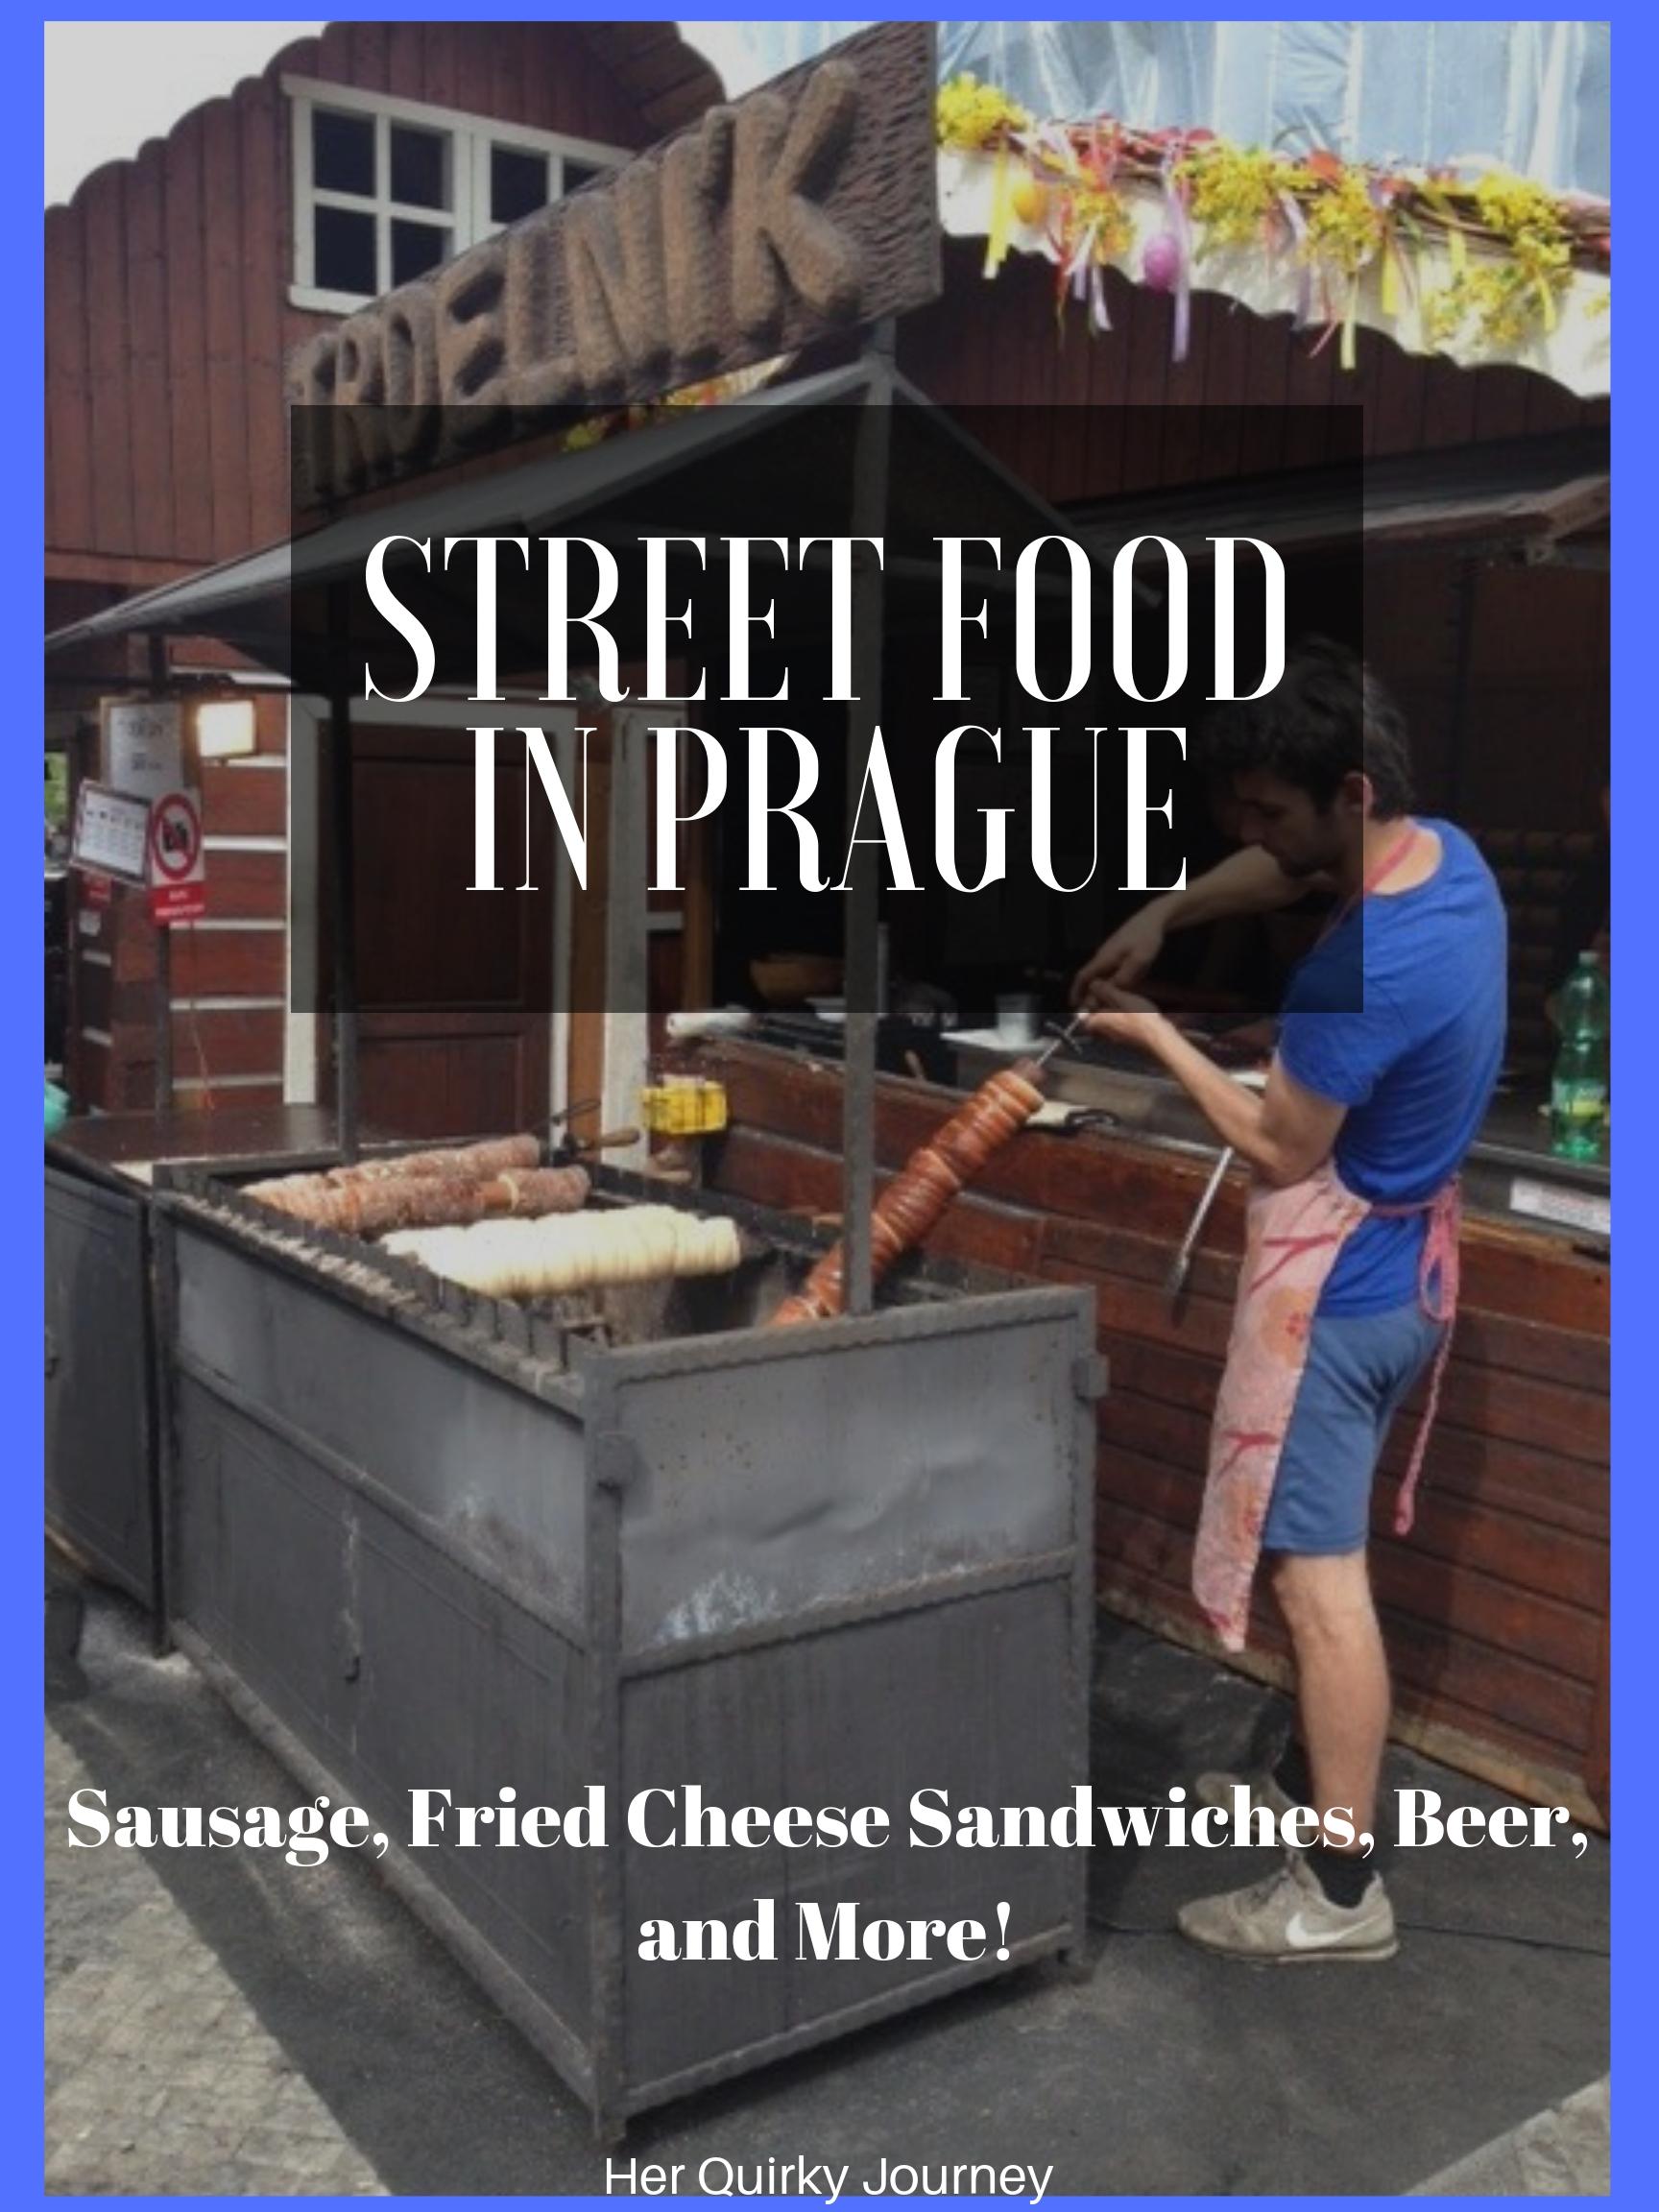 Street Food Prague (1).jpg